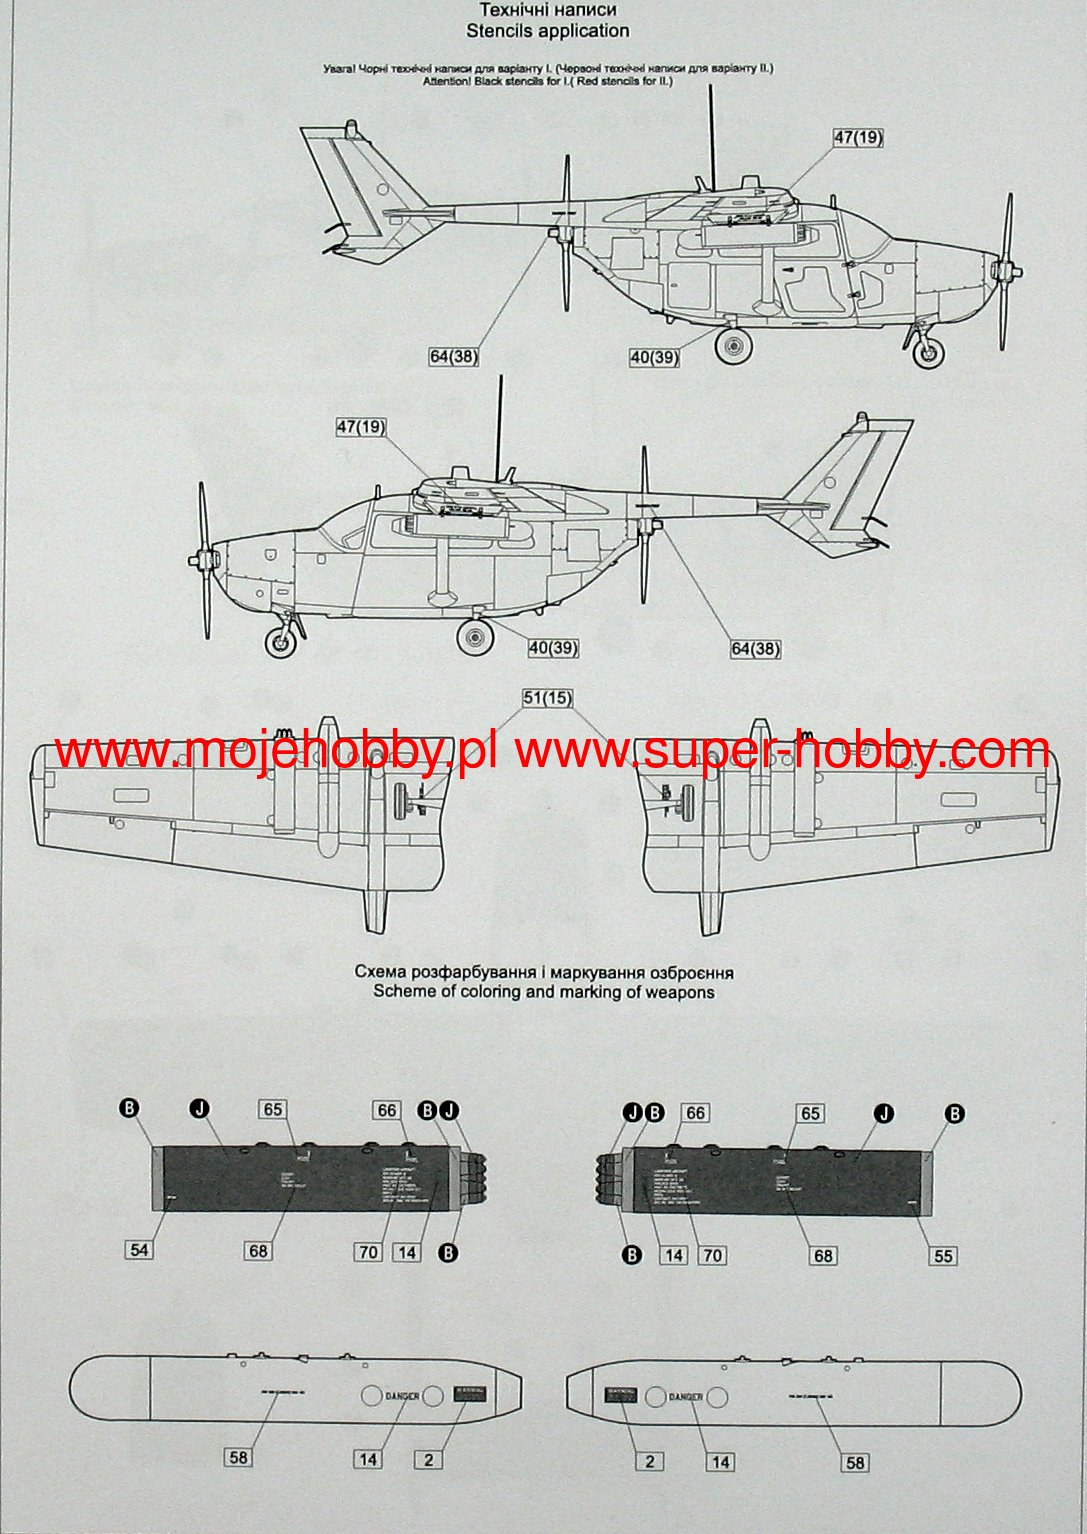 Fantastisch Cessna 172 Schaltplan Ideen - Elektrische Schaltplan ...